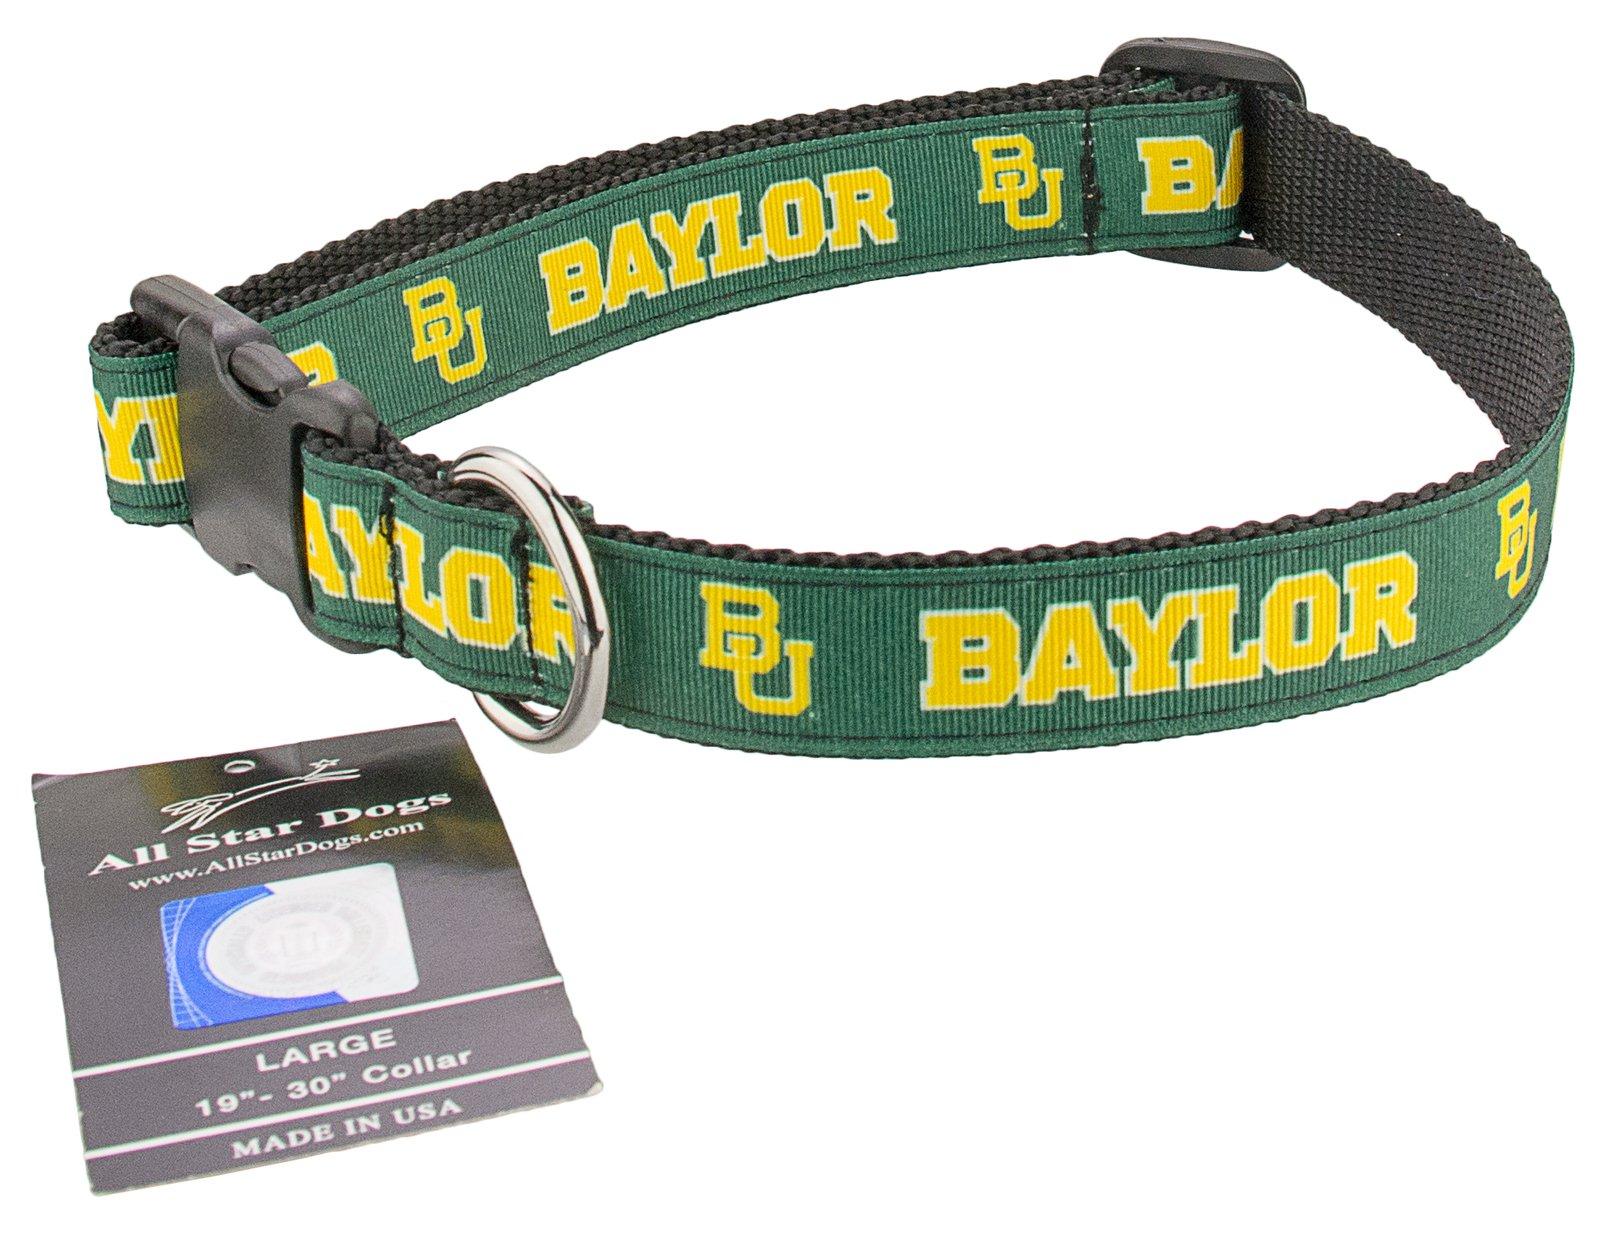 All Star Dogs Baylor Bears Ribbon Dog Collar - Extra Small